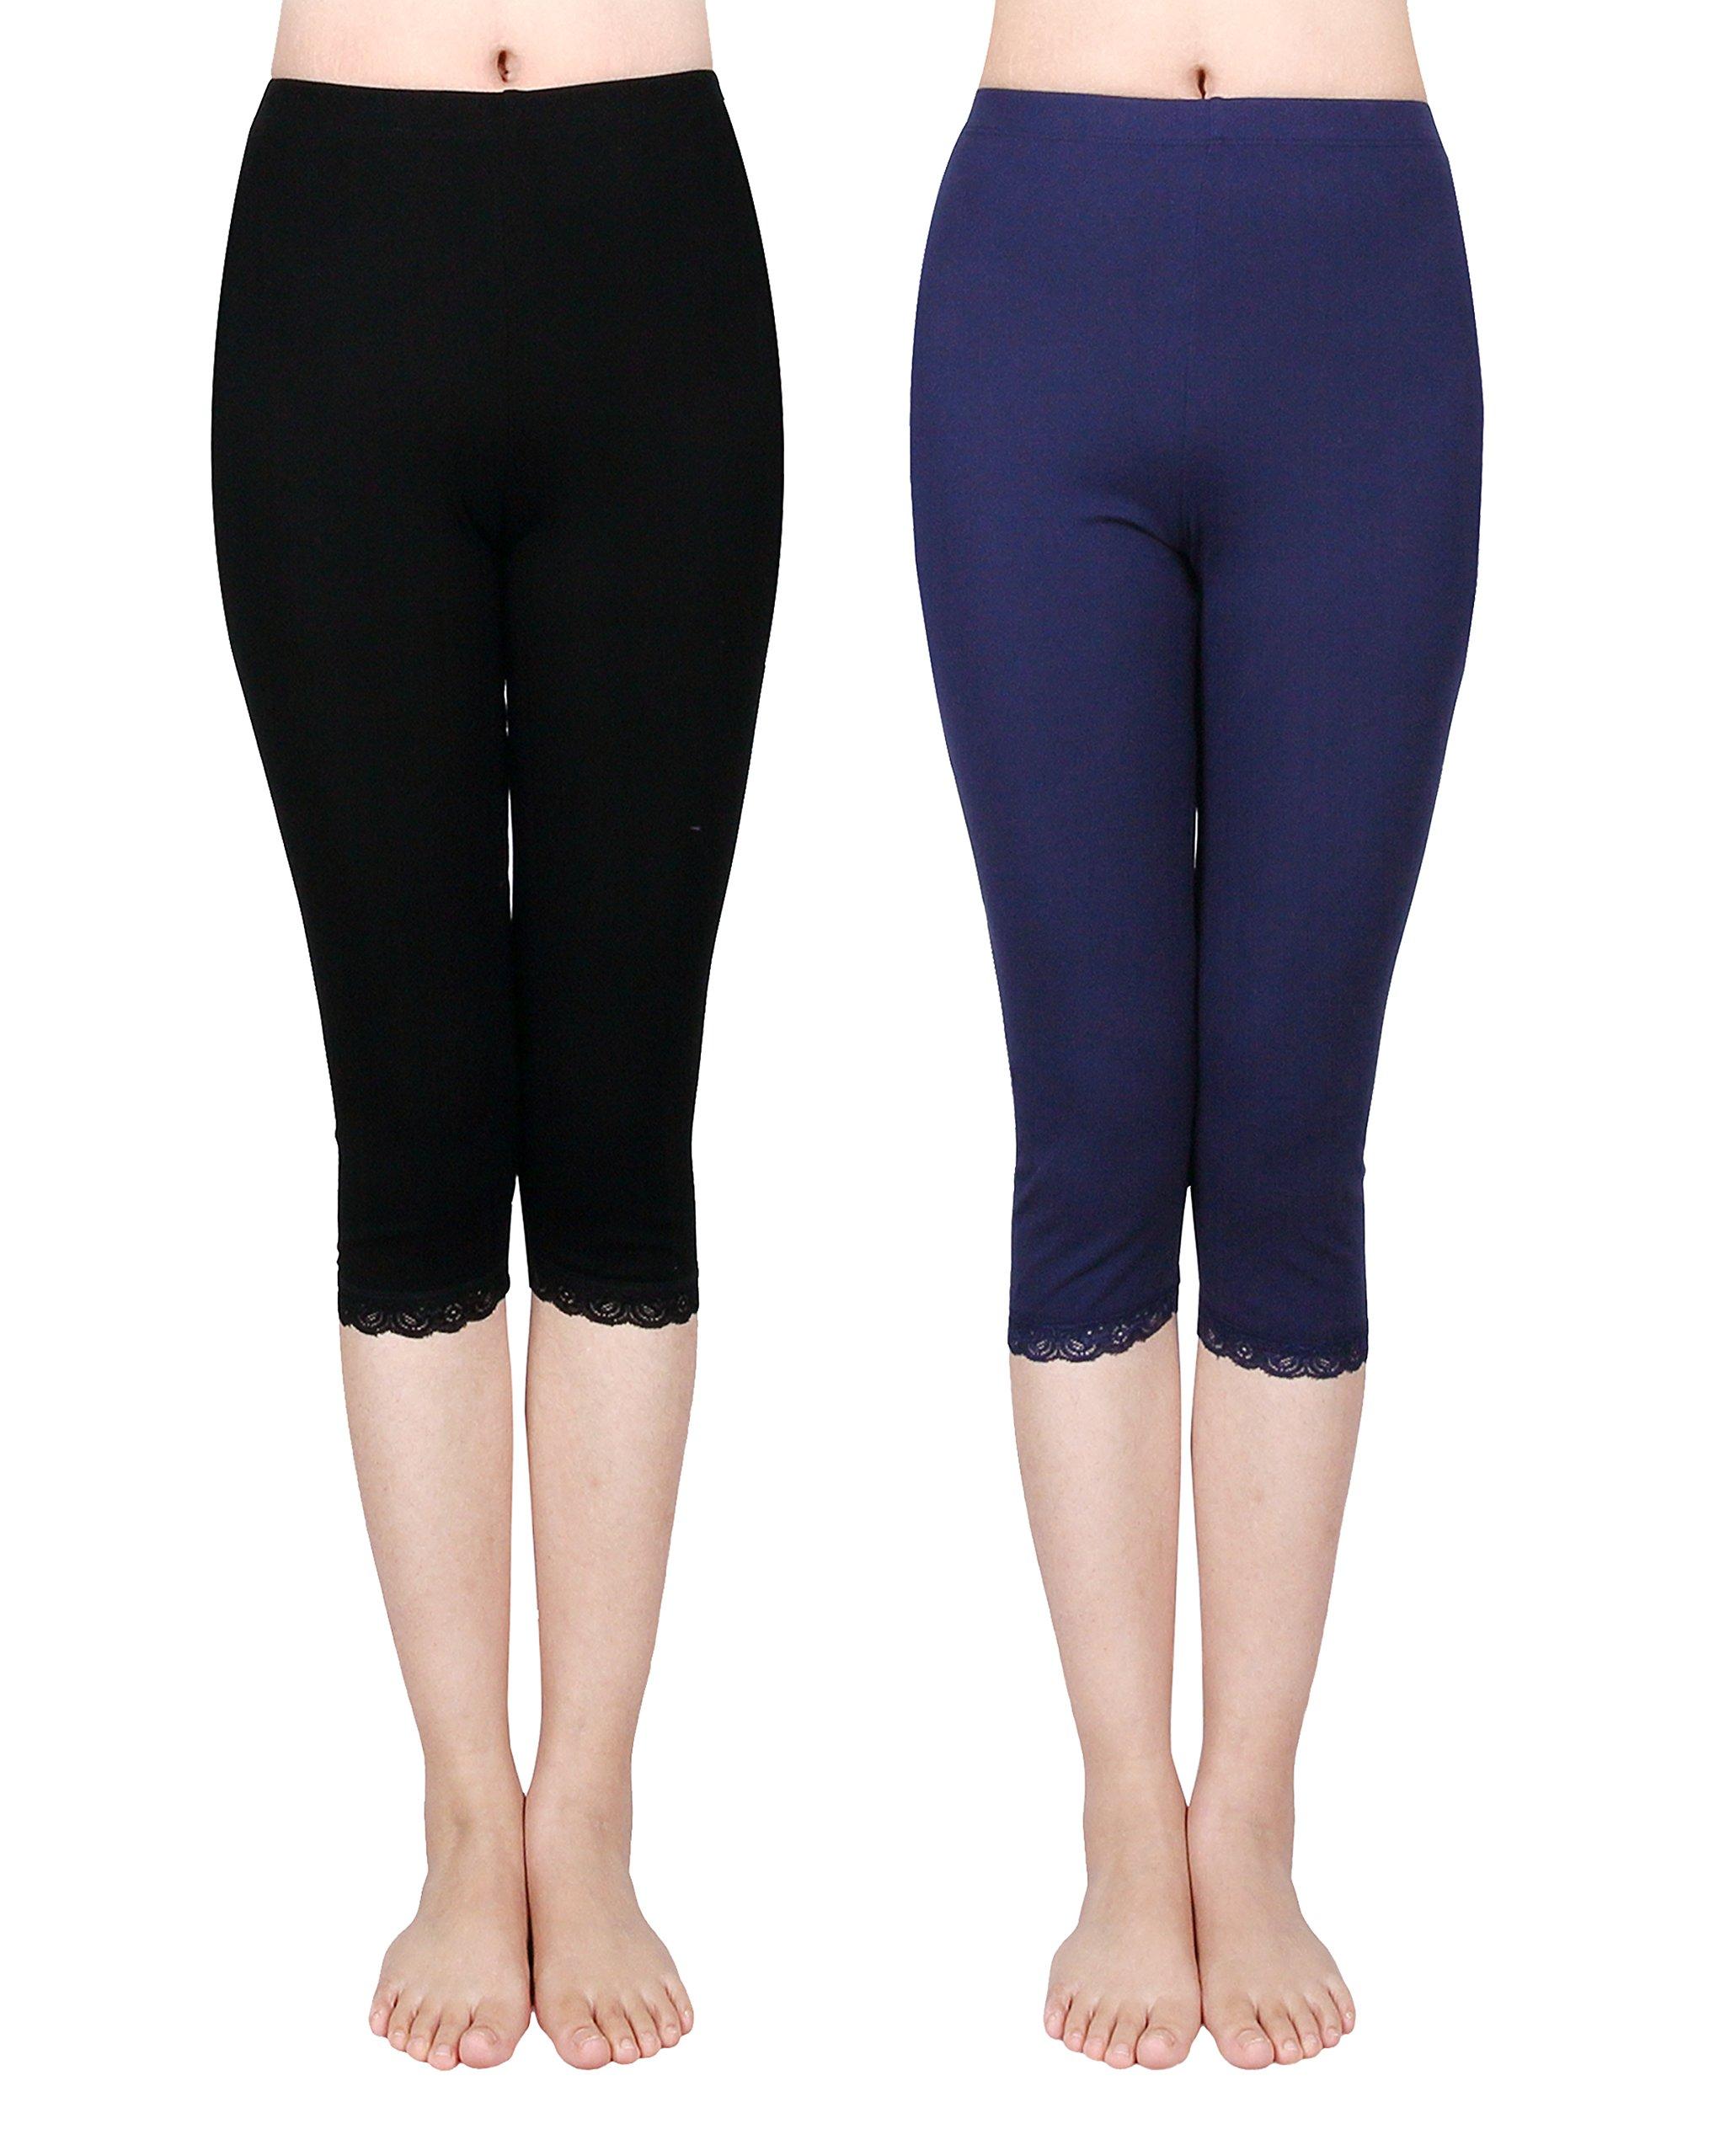 IRELIA 2 Pack Cotton Girls Leggings Capri with Lace Trim Pant Size 6-16 03 M by IRELIA (Image #1)